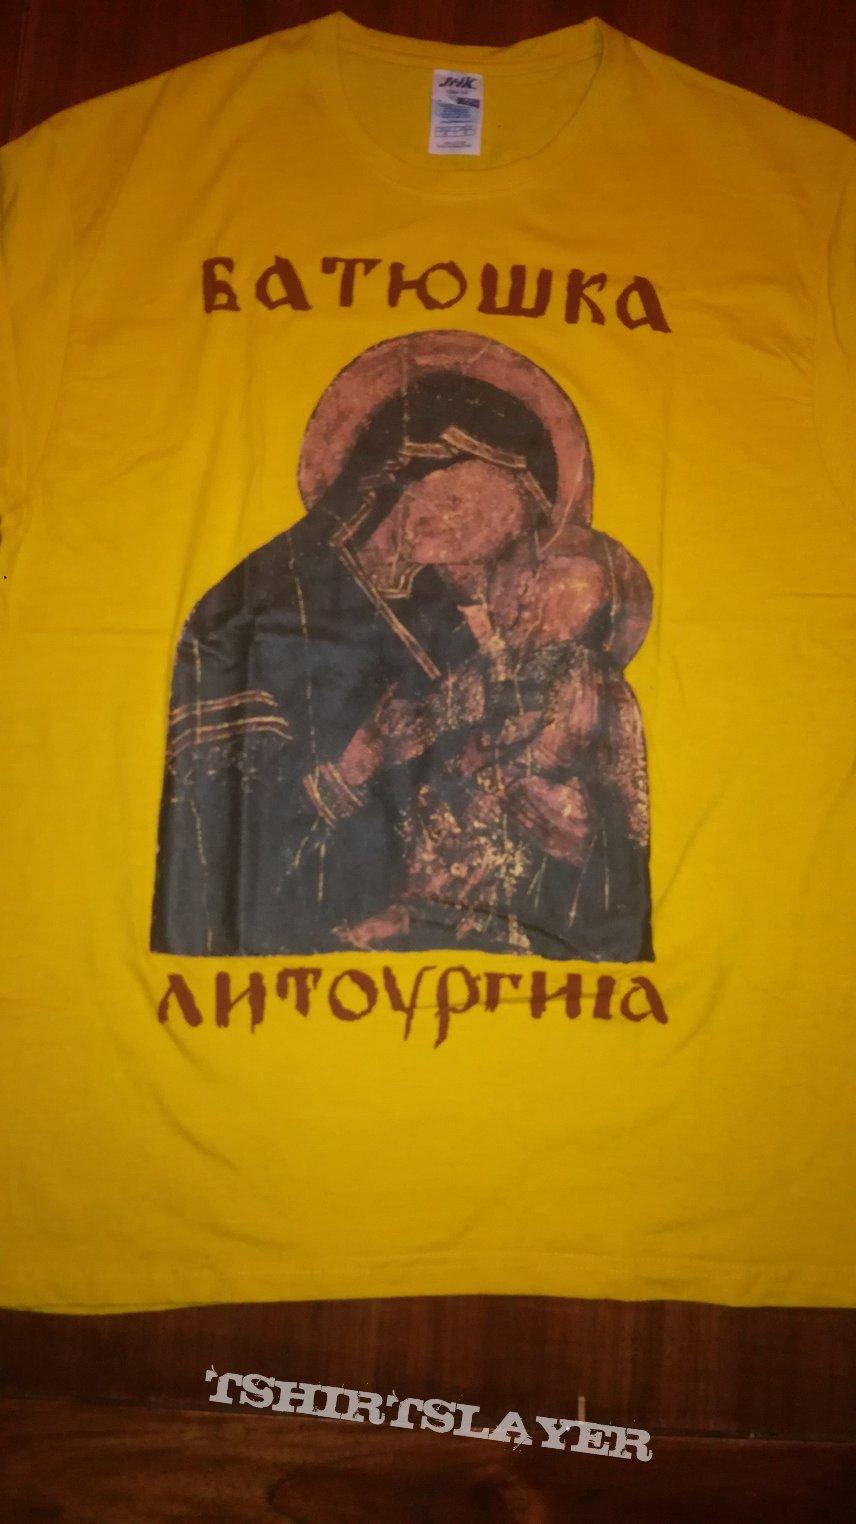 Batushka - 2018 tour shirt